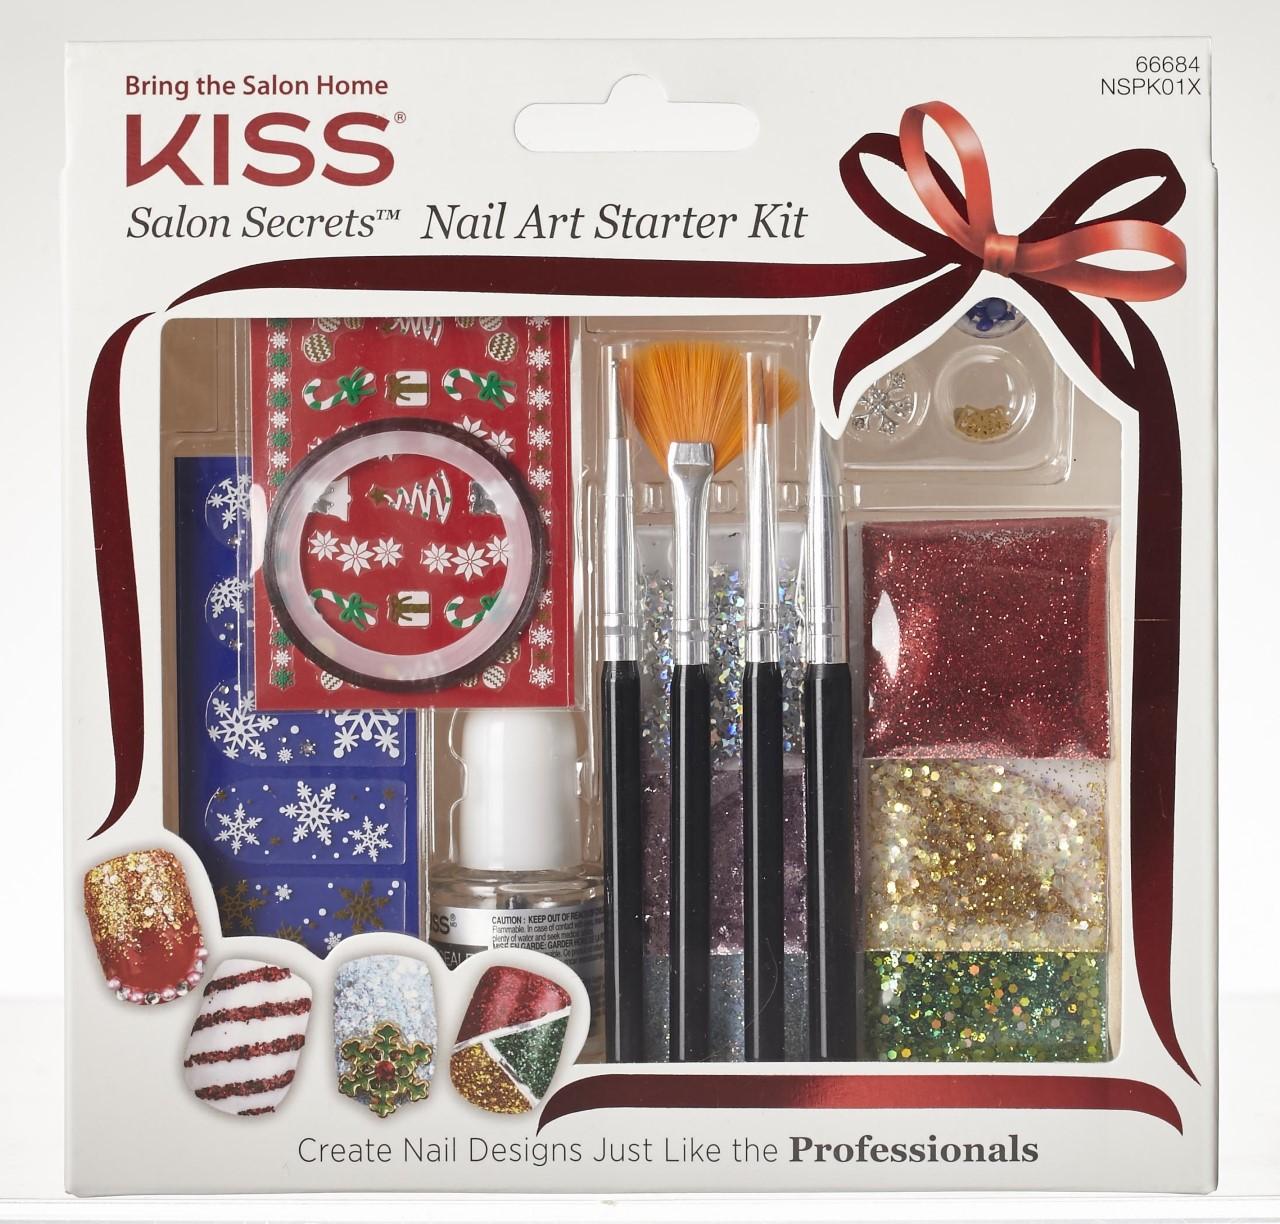 thumbnail_kiss_nailartstarterkit_nspk01x_package_aug-09-2016